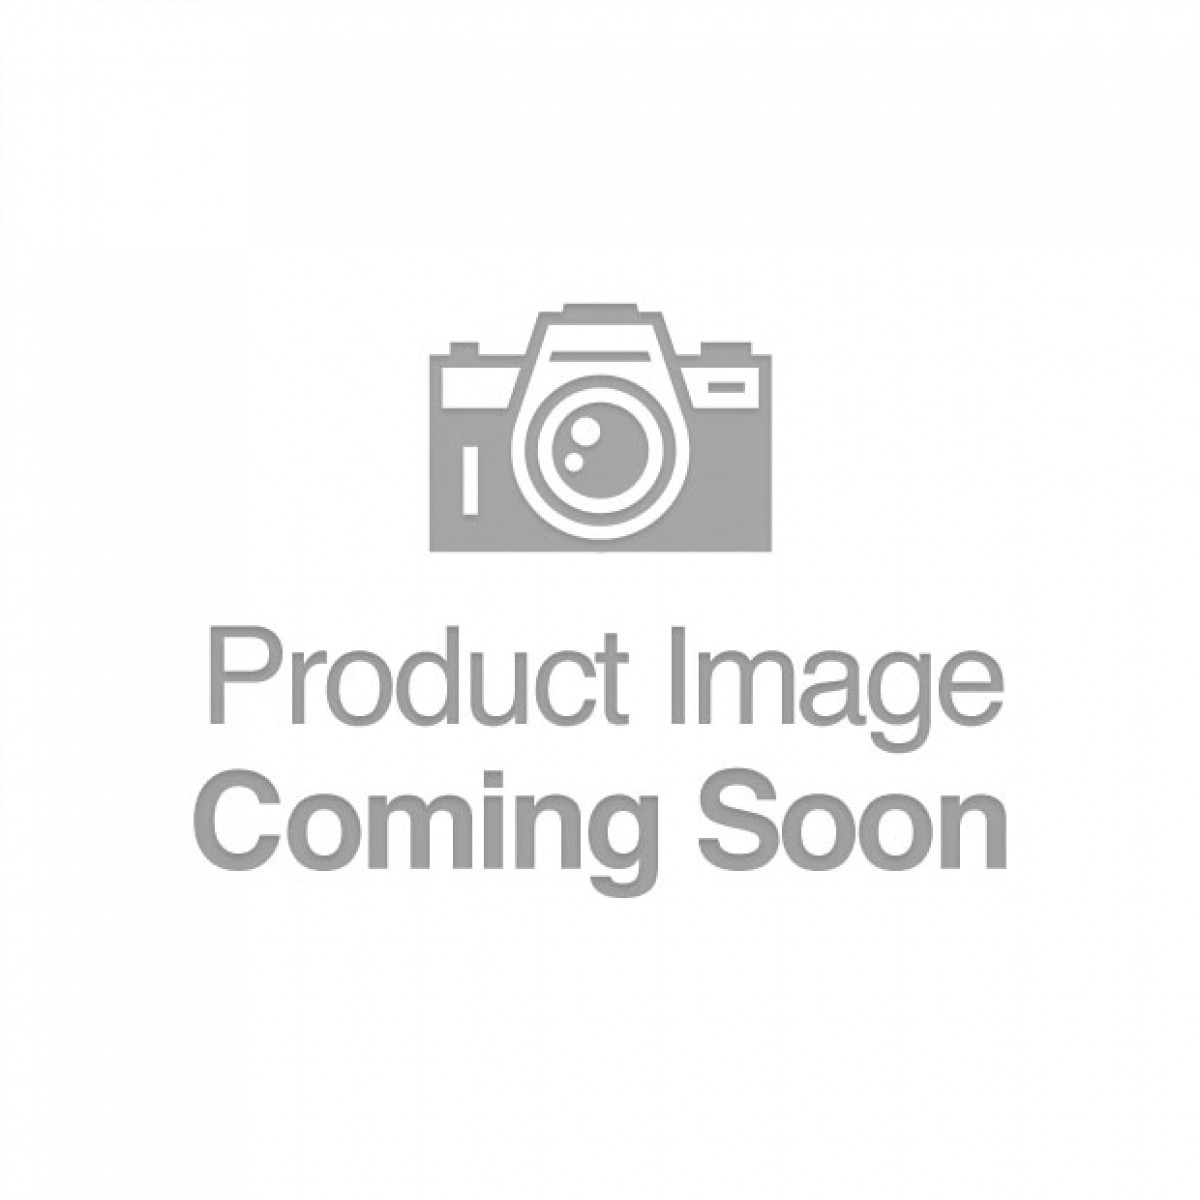 We-Vibe Tango/Womanizer Premium Silver Delights Collection - Silver/Black